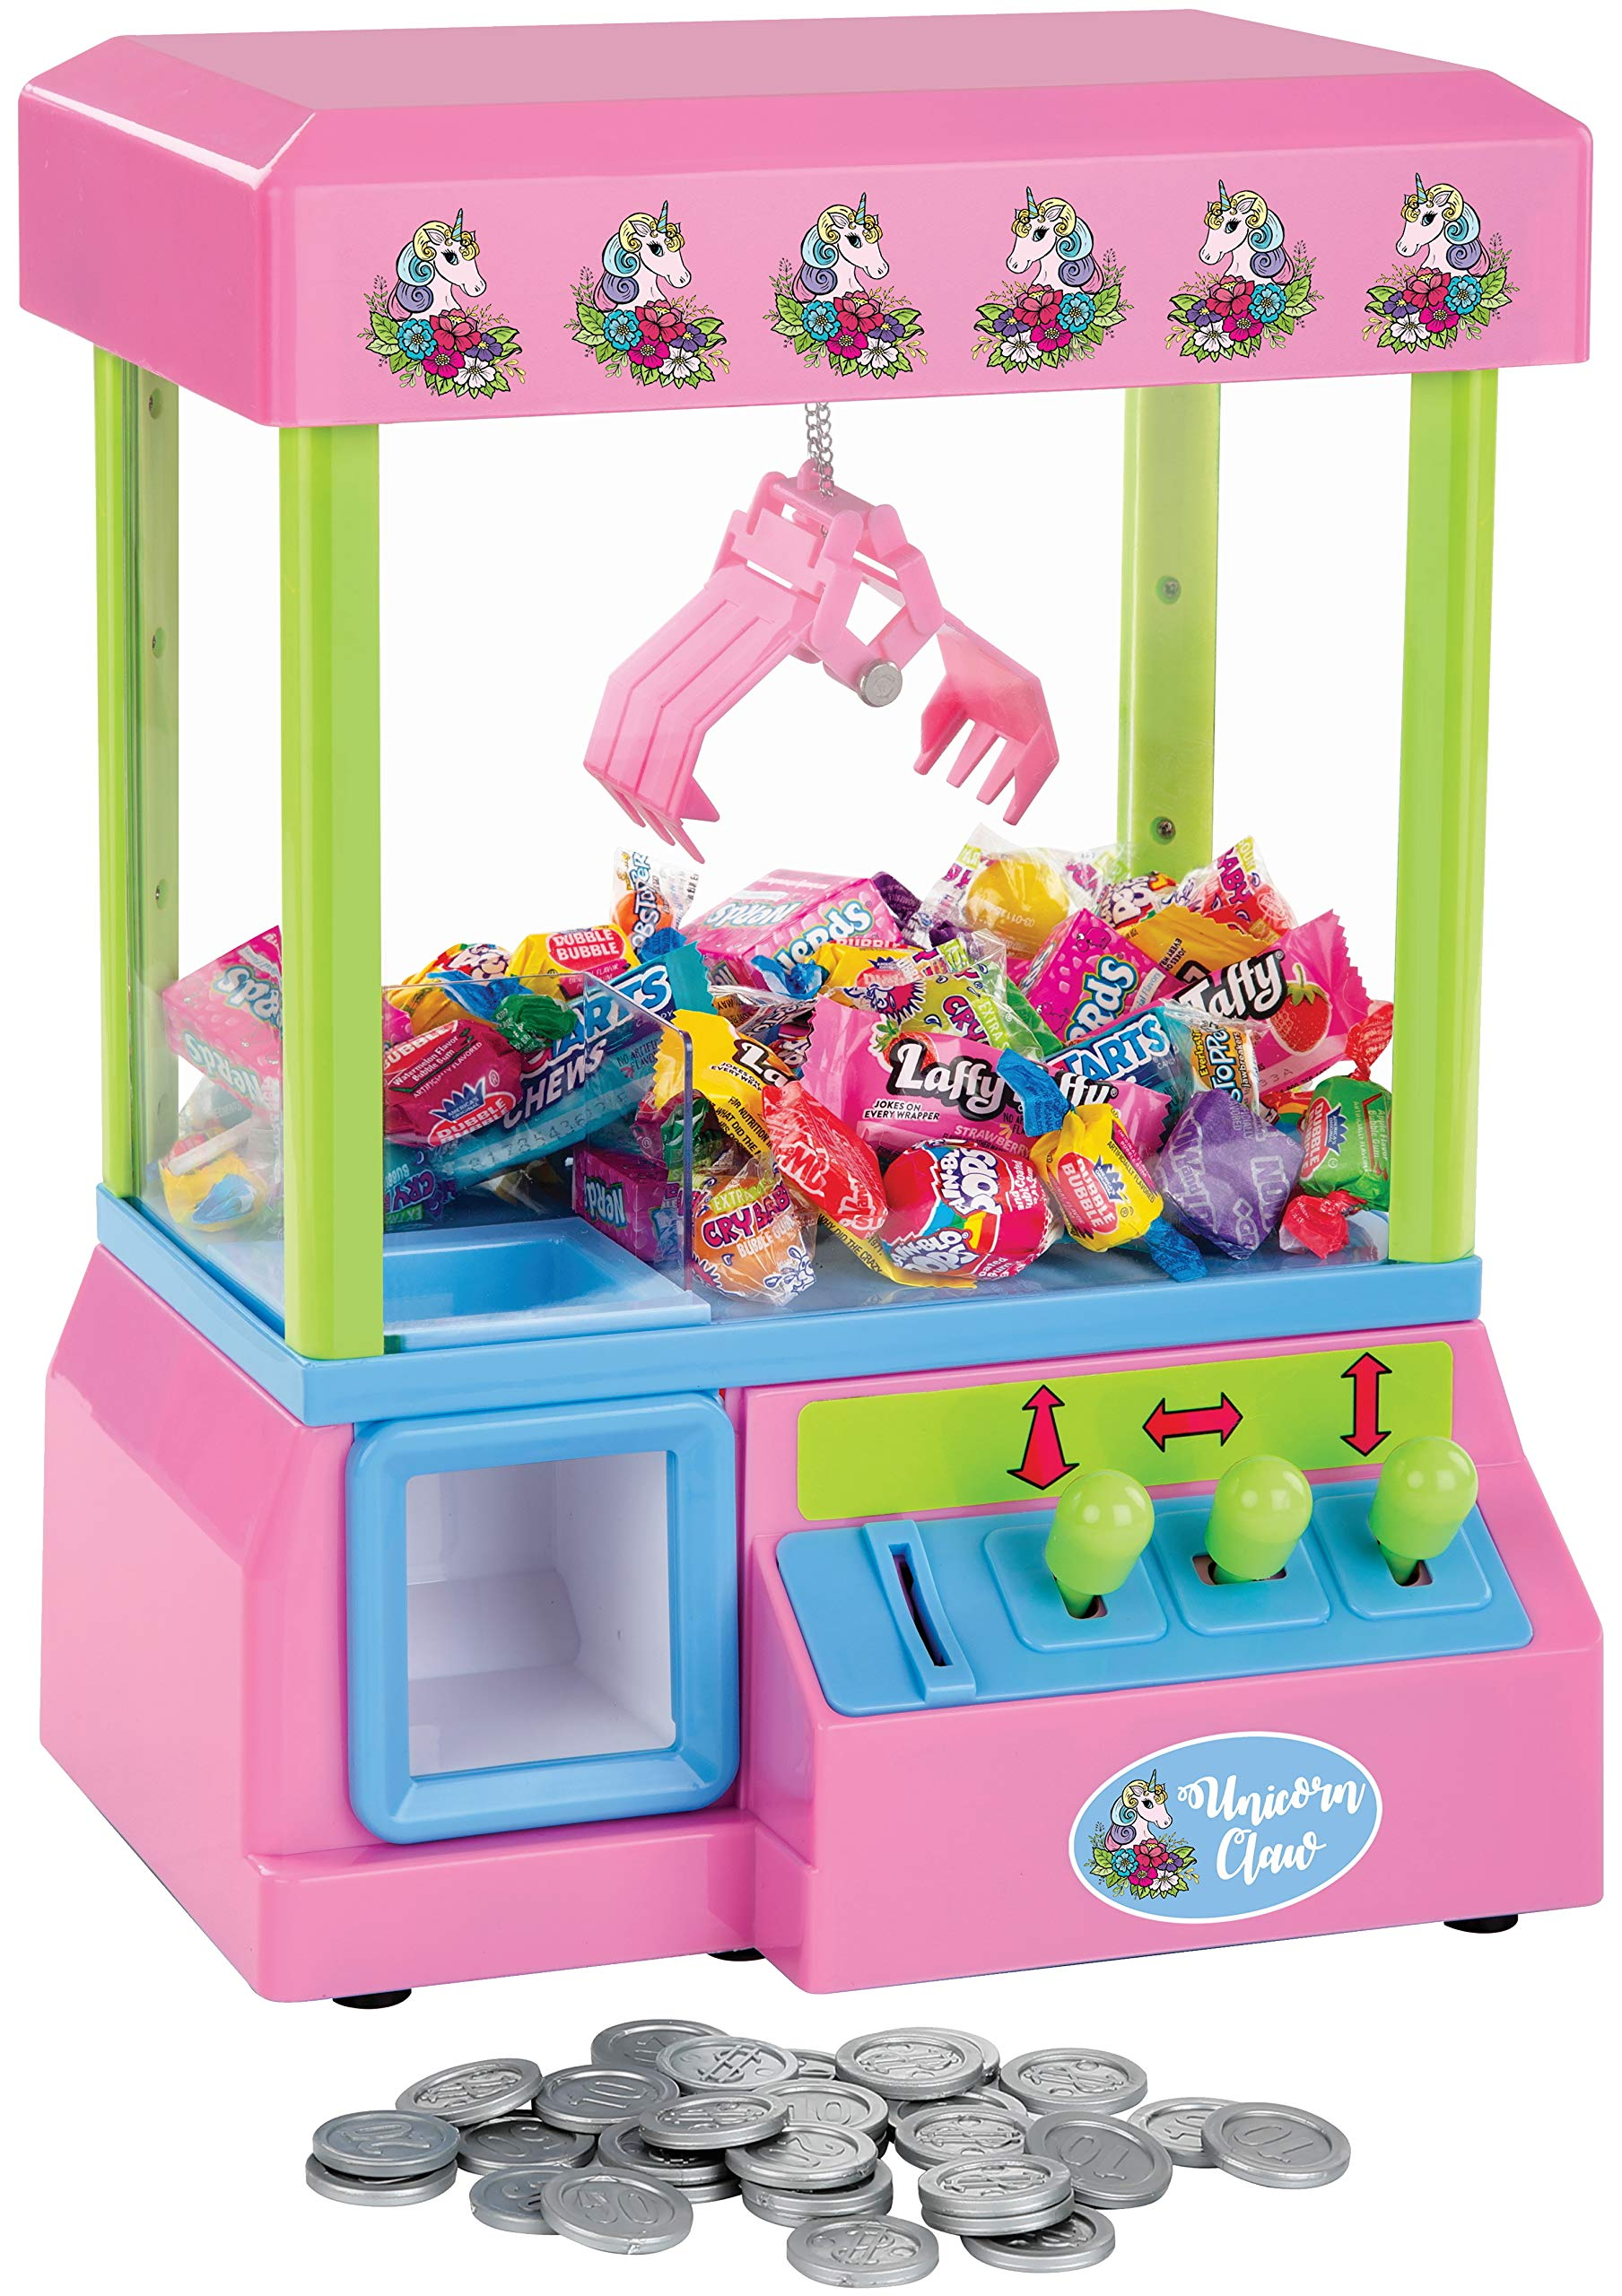 Bundaloo Unicorn Mini Claw Machine - Retro Grabber Arcade Game for Kids - Candies, Toys, Treats Catcher, Small Vending Dispenser - 30 Tokens, 3-Lever Design, Fun Sound Effects - 10 x 13.5 x 8 Inches by Bundaloo